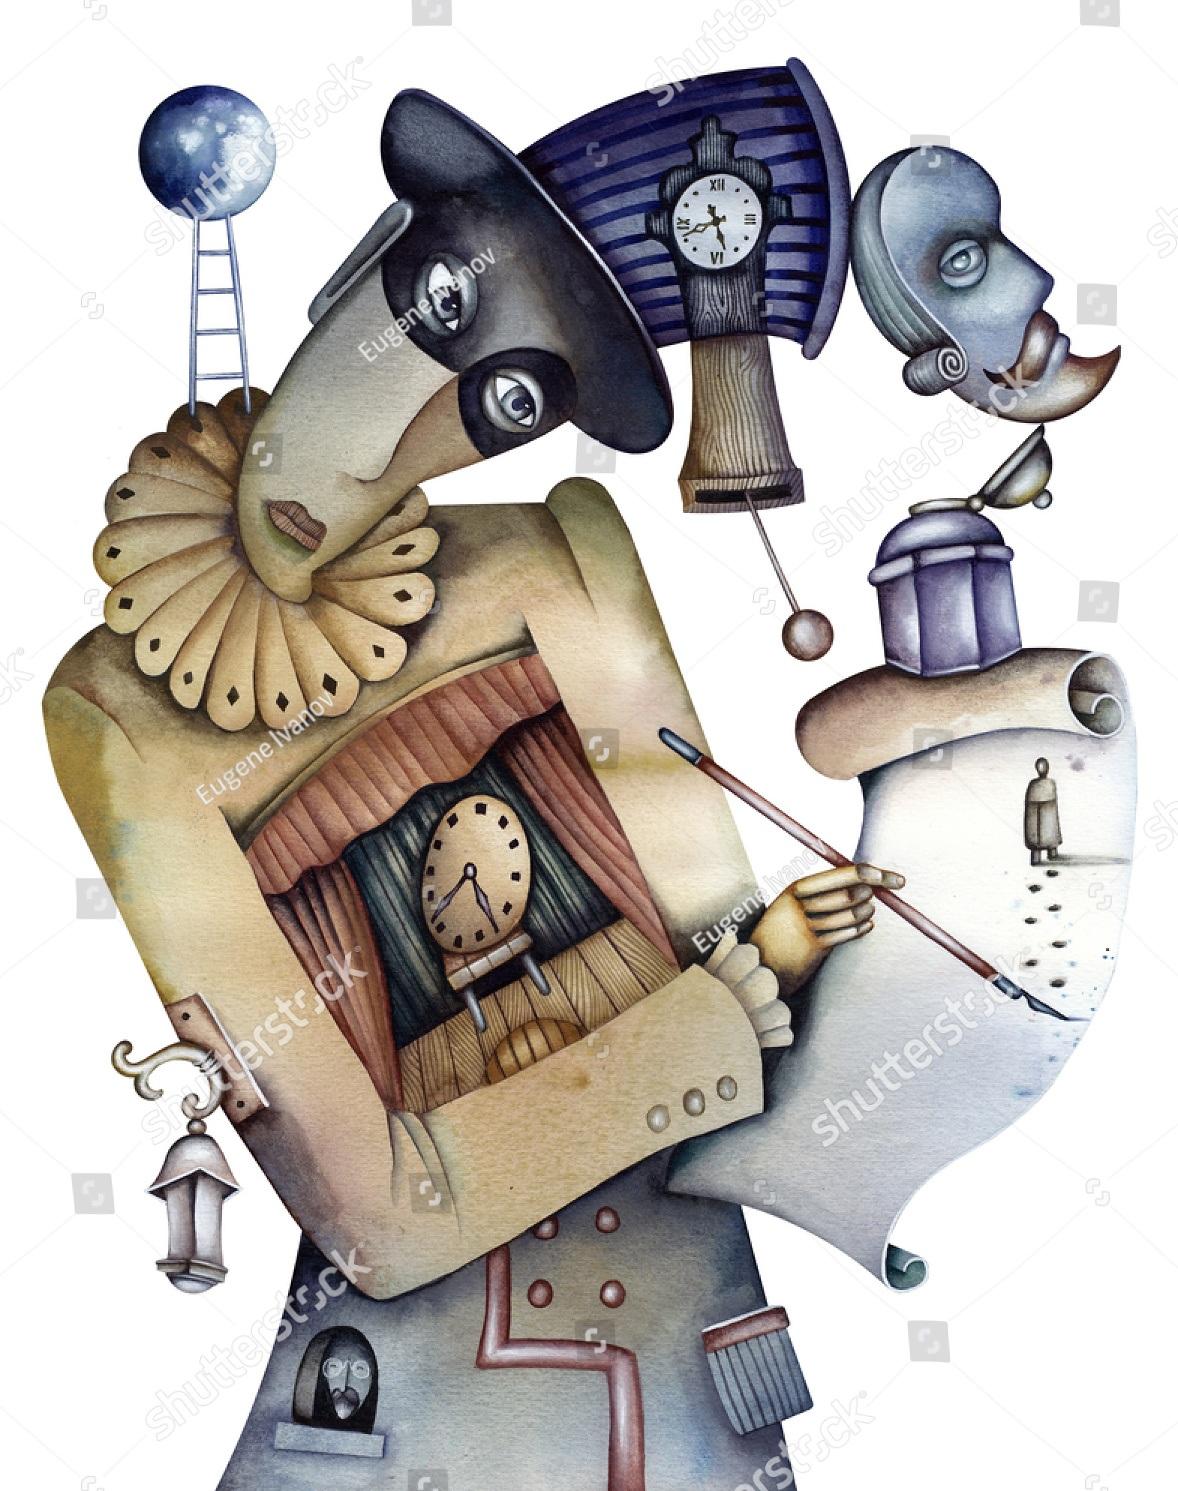 stock-photo-the-theater-illustration-illustration-by-eugene-ivanov-106059710.jpg